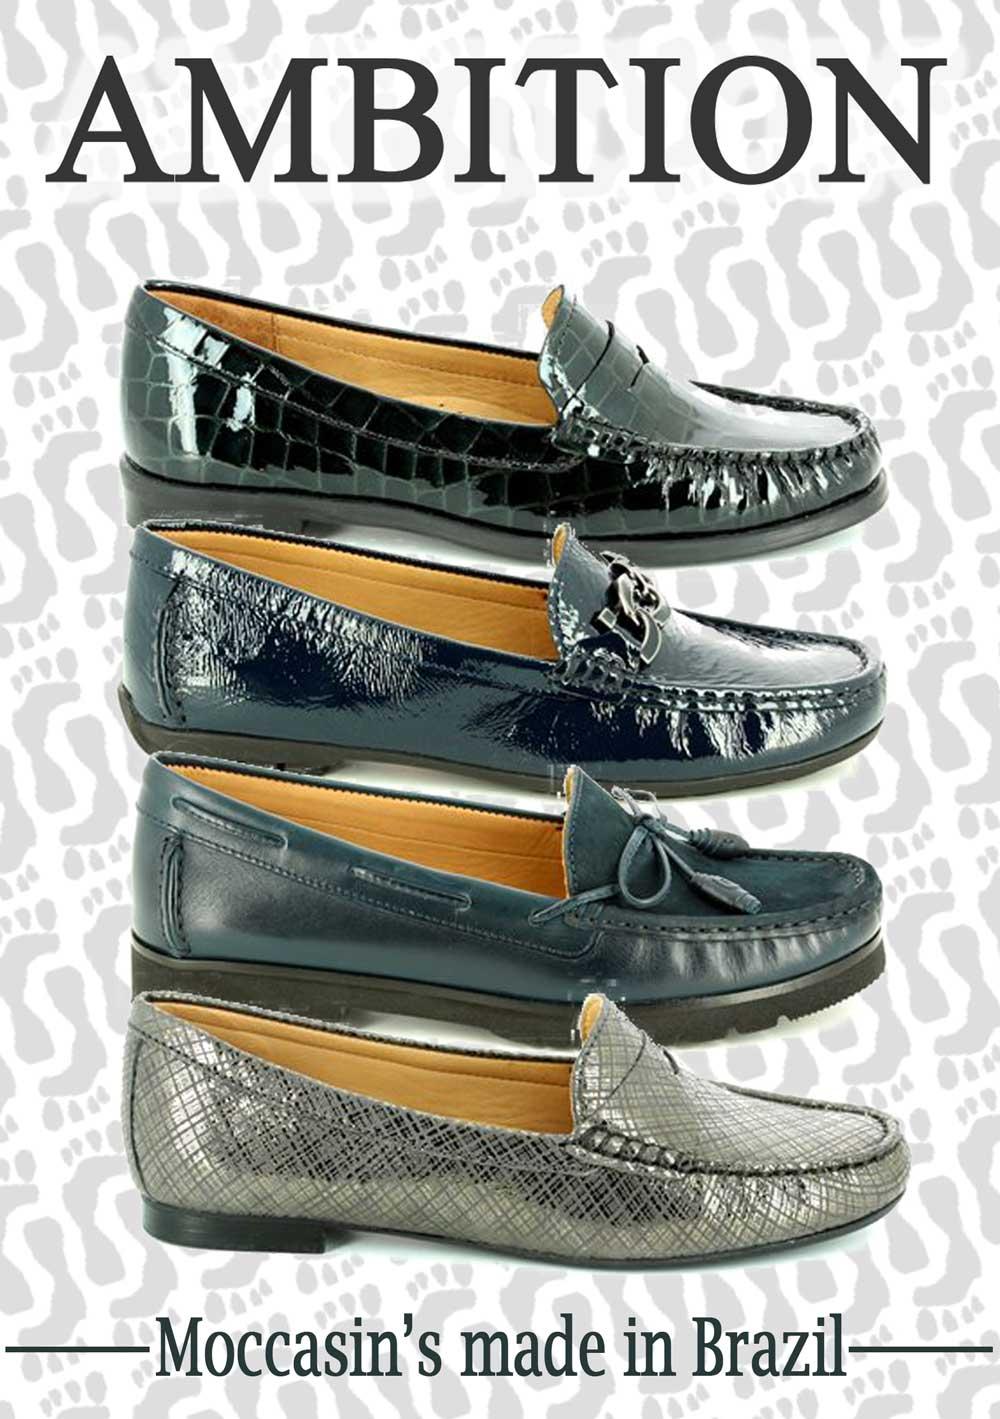 Ambition Shoes